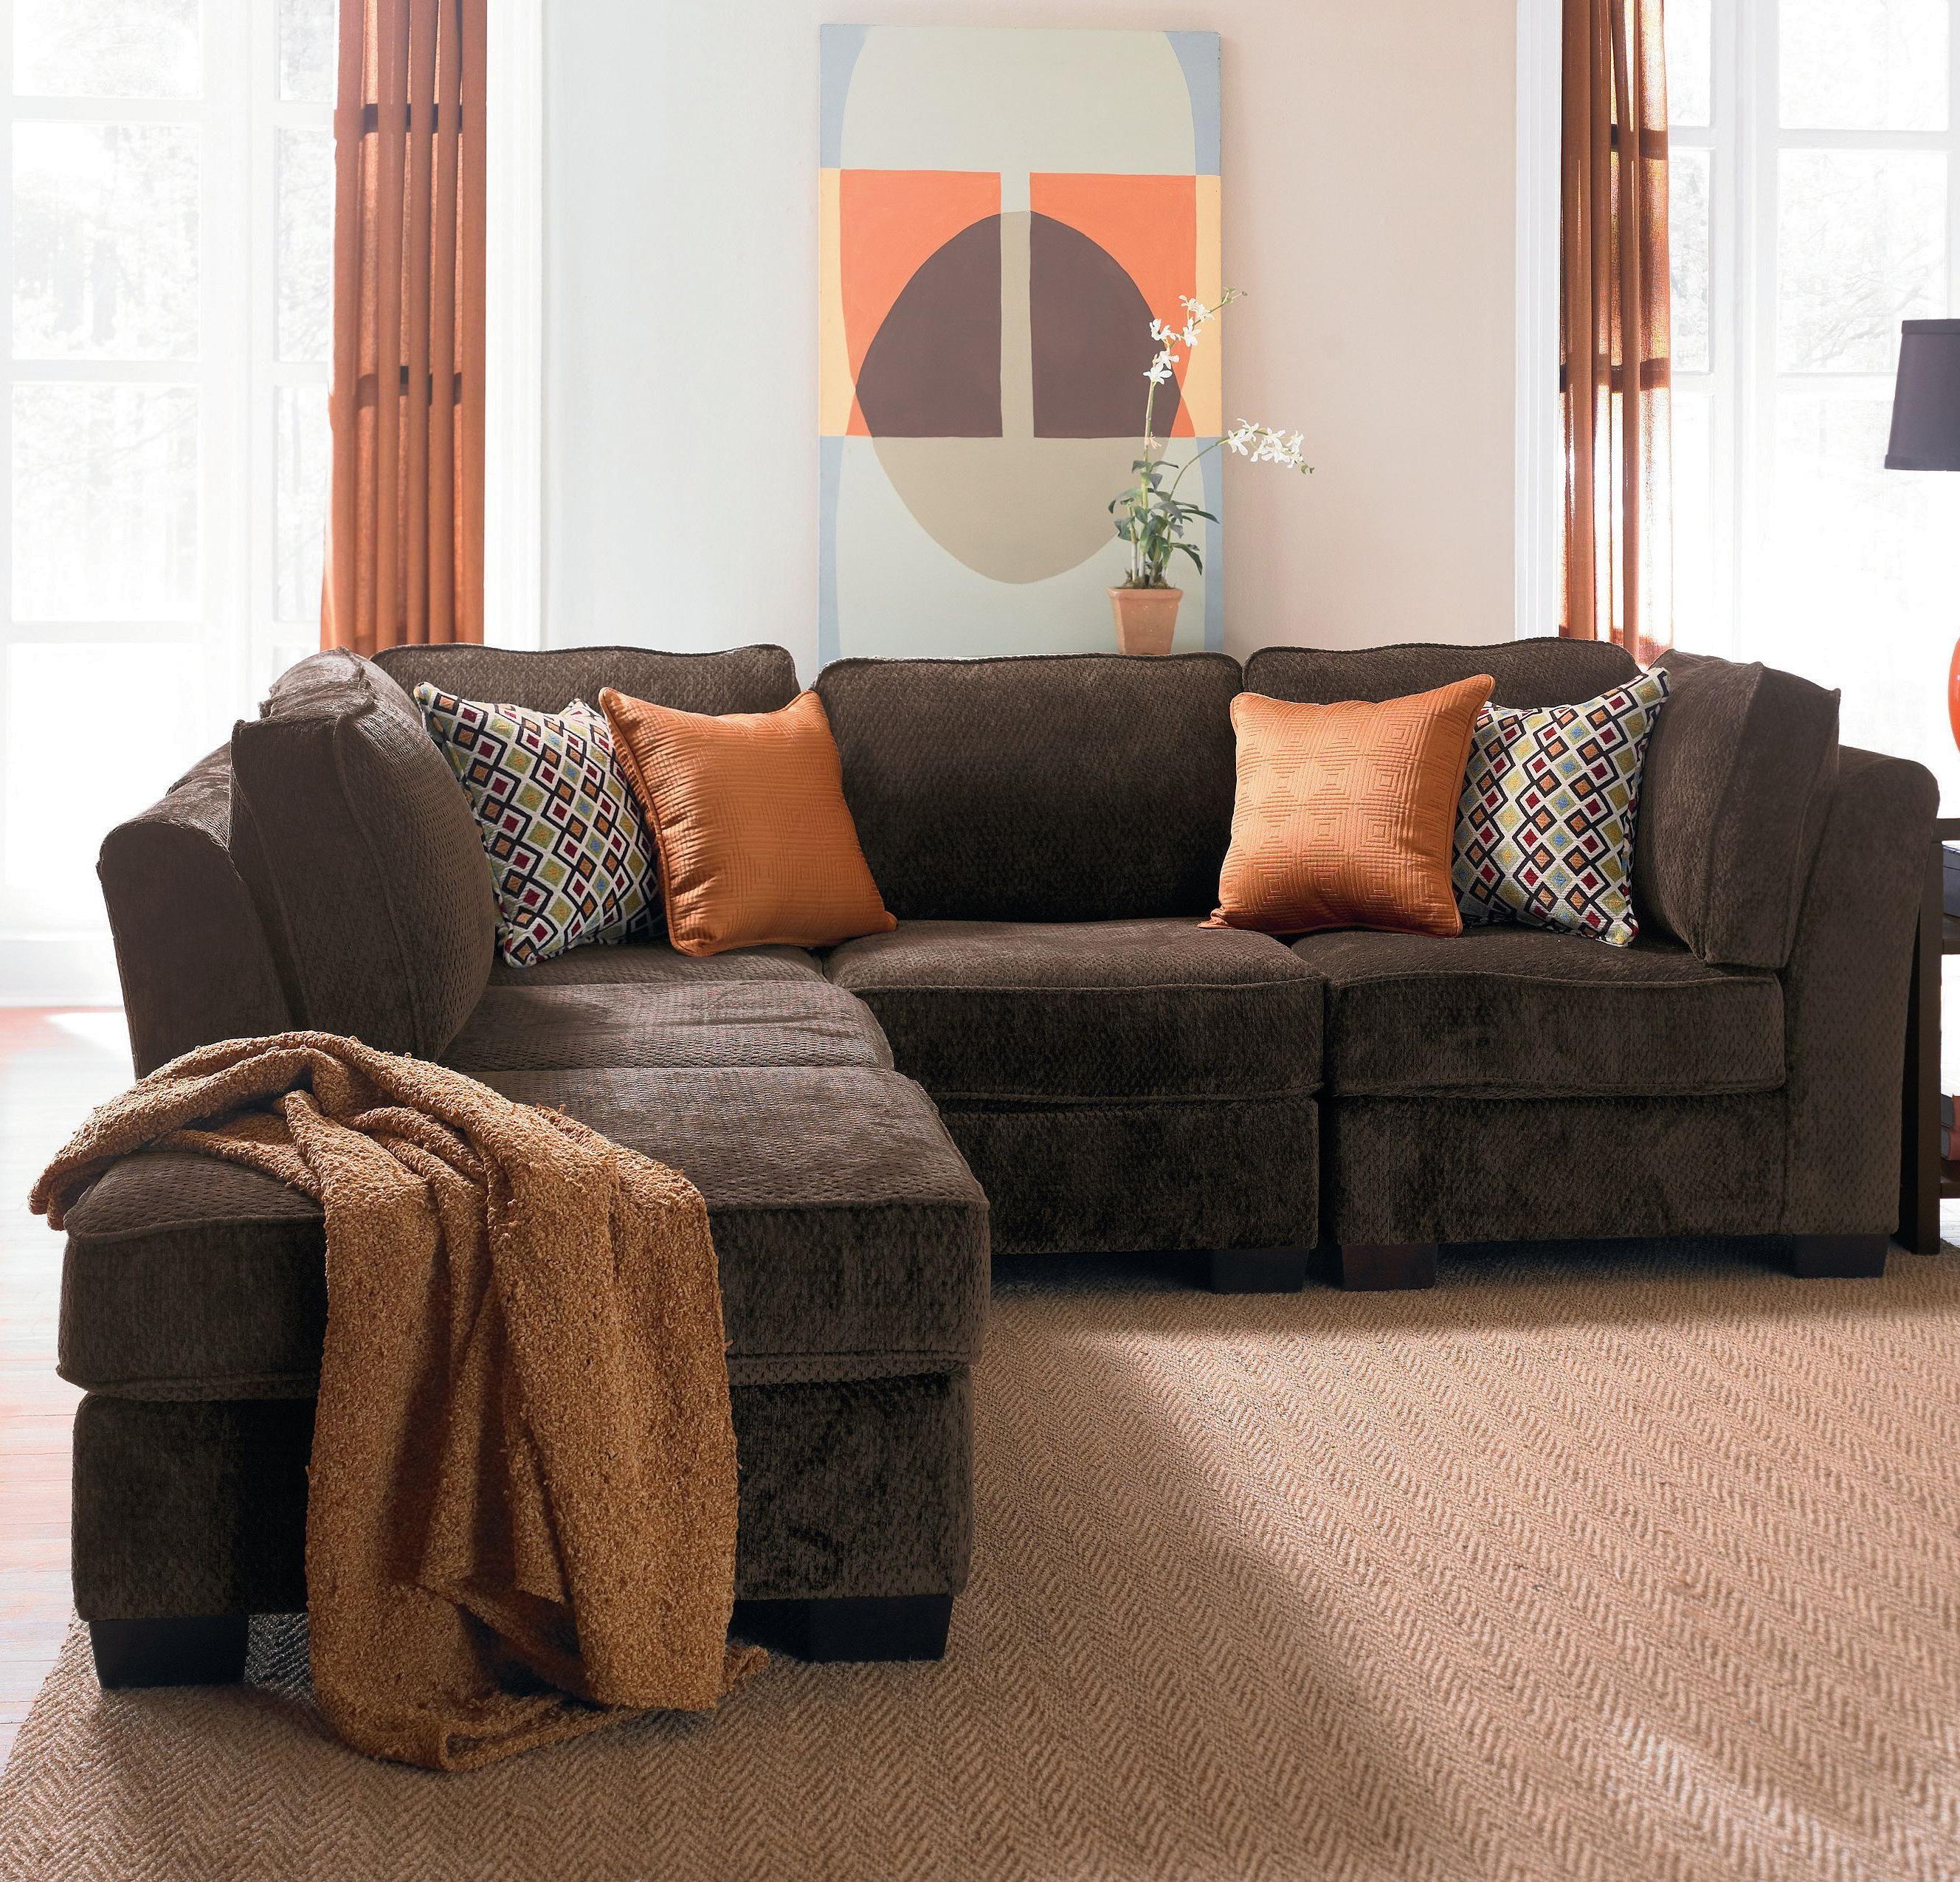 Best Roxy 5 Piece Modular Sectional By Lane Home Goods Decor 400 x 300